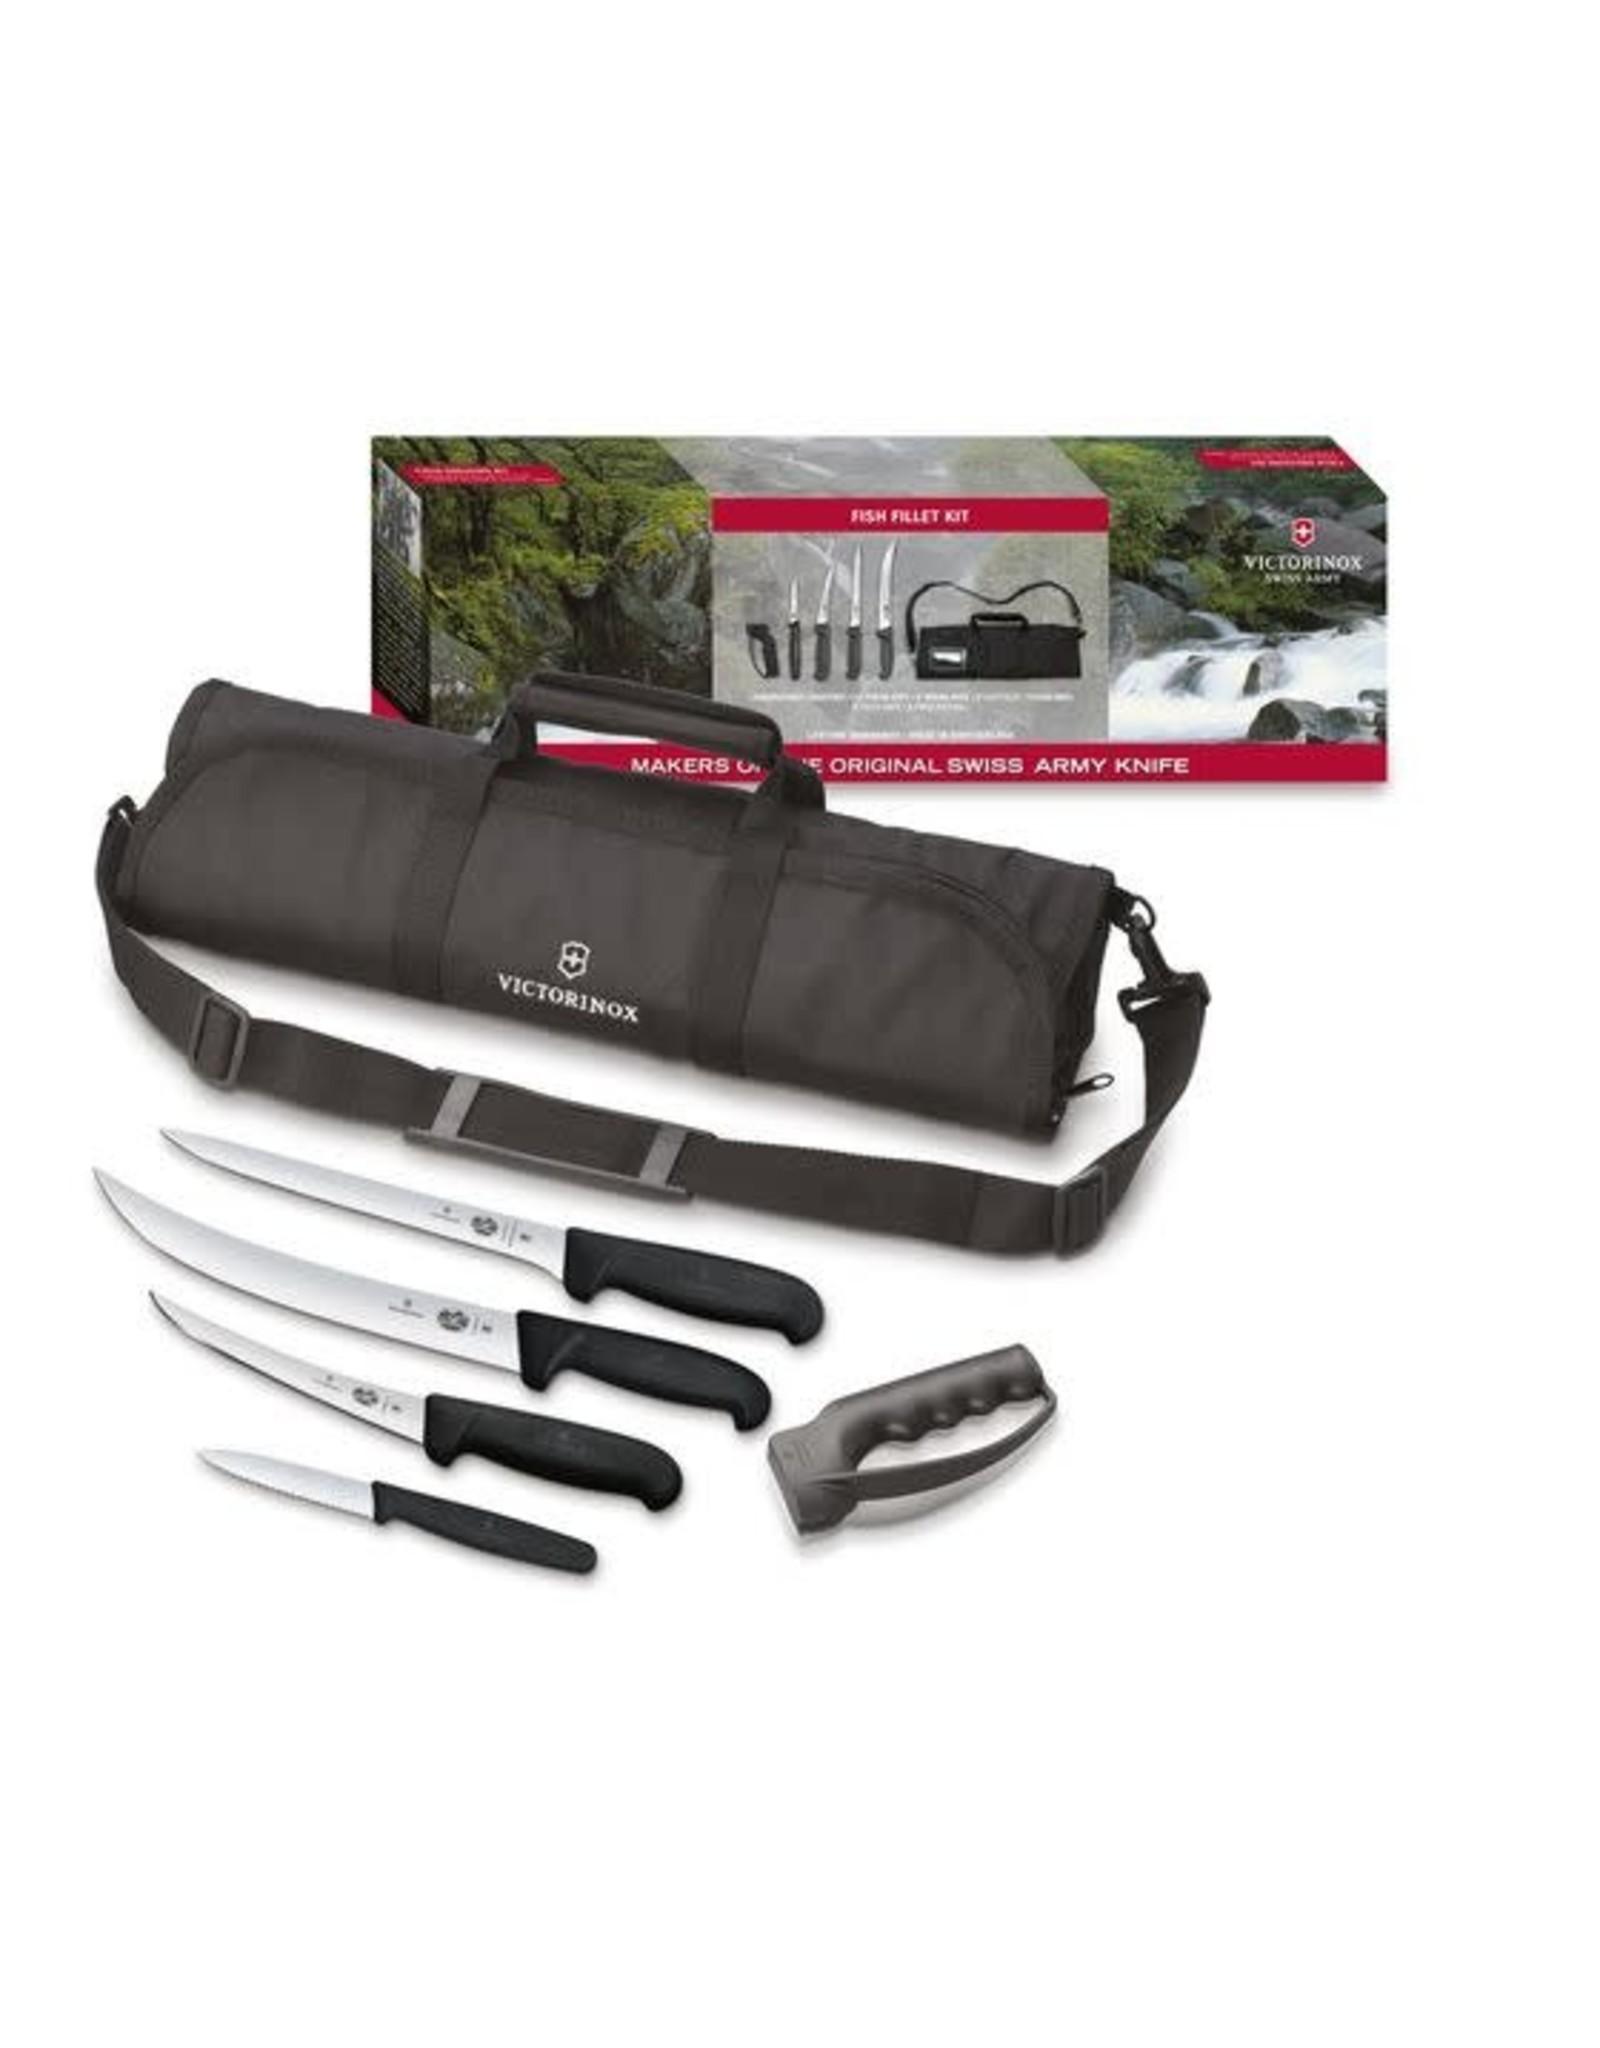 Victorinox VICTORNOX- Fish Fillet Kit